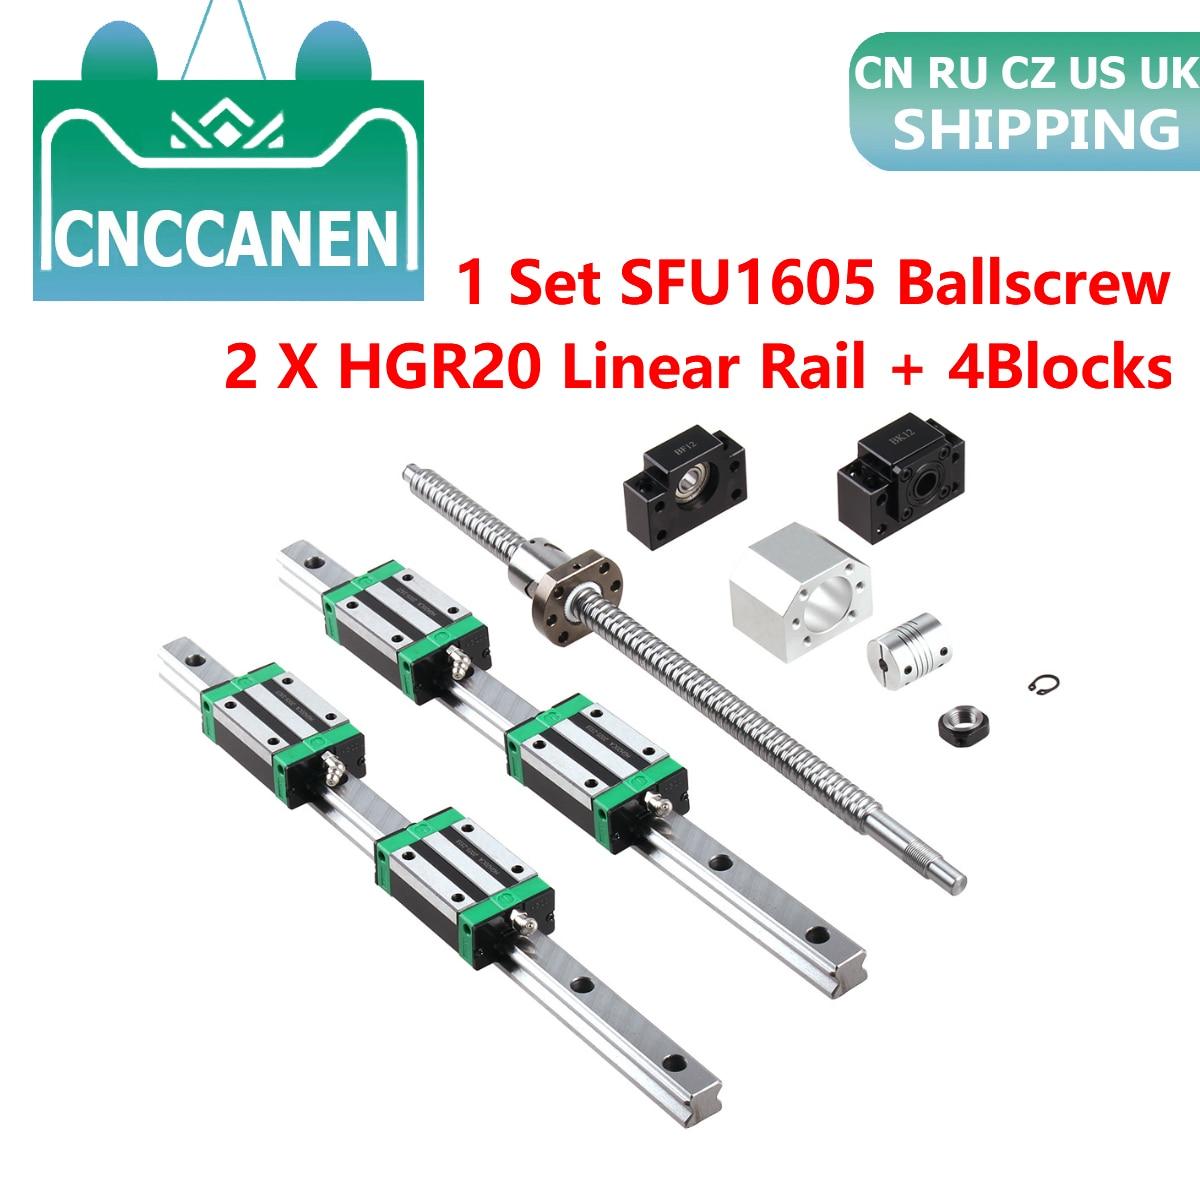 RU HGR20 مربع الخطي دليل السكك الحديدية 2 مجموعة HGR20 + كتلة HGH20CA + SFU1605 الكرة المسمار 5 مللي متر الرصاص + BK12BF12 CNC خطي المحرك